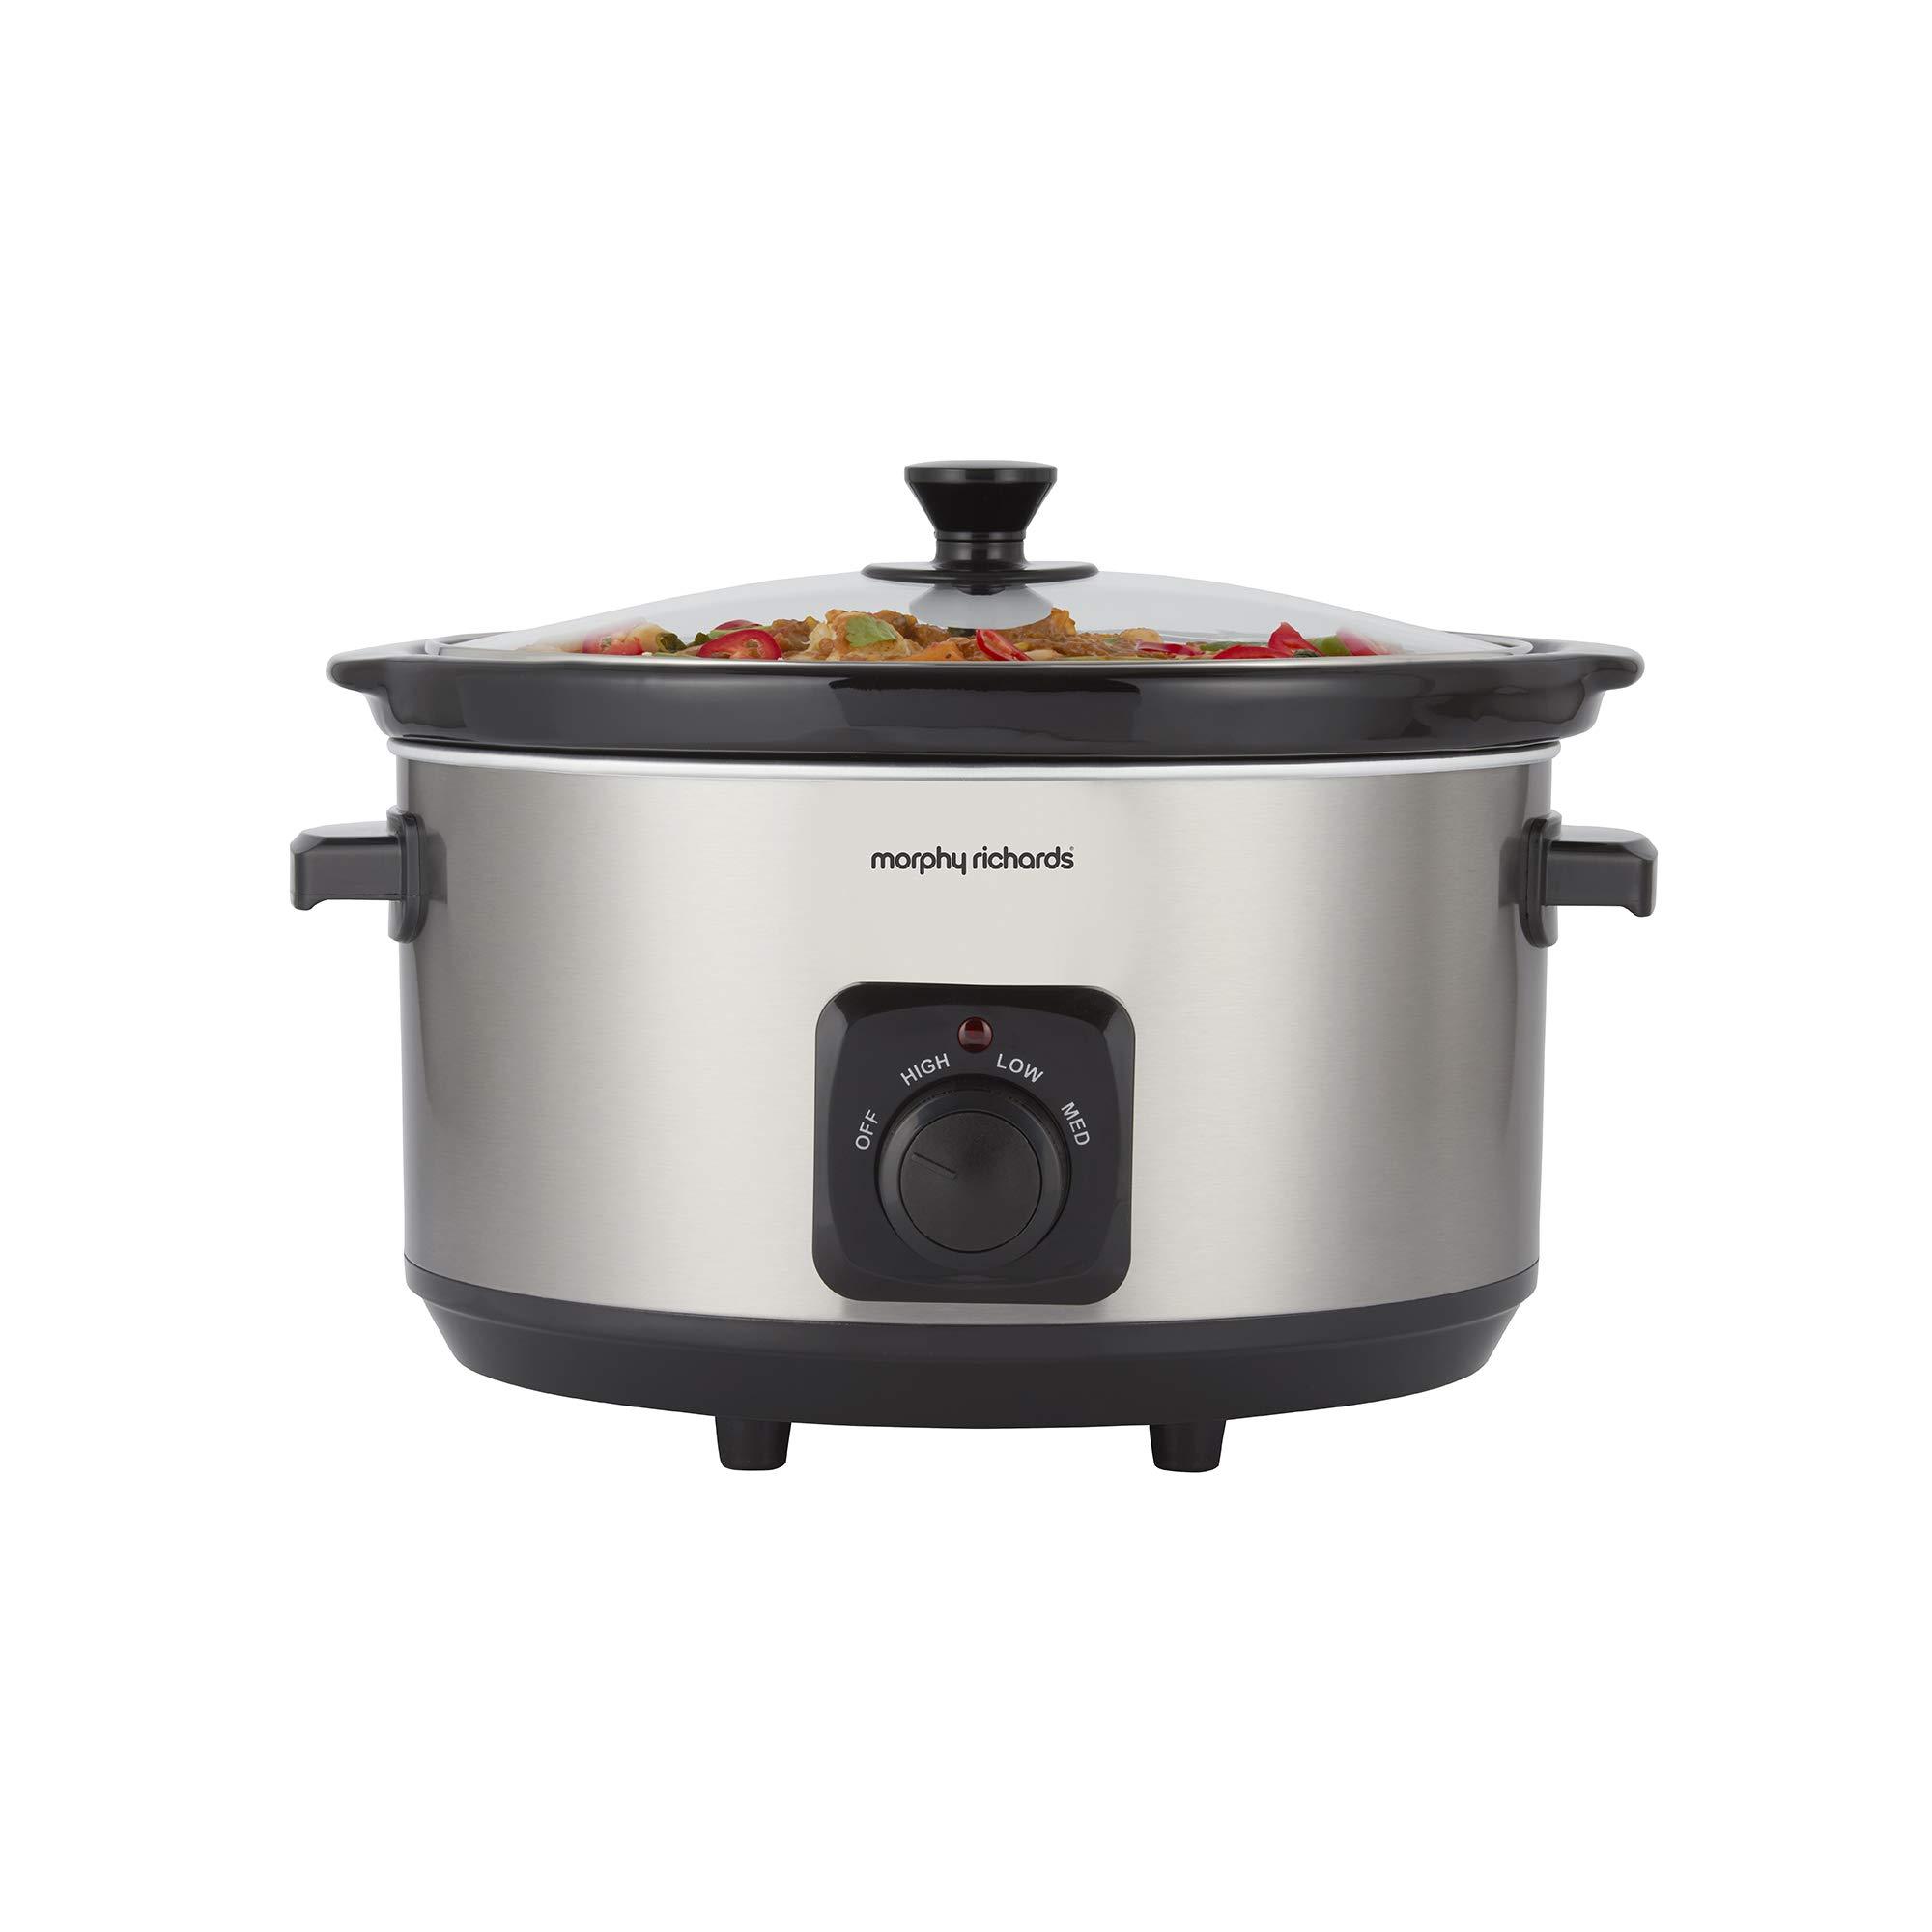 Morphy Richards 461013 6.5 Litre Ceramic Slow Cooker, One-Pot Solution